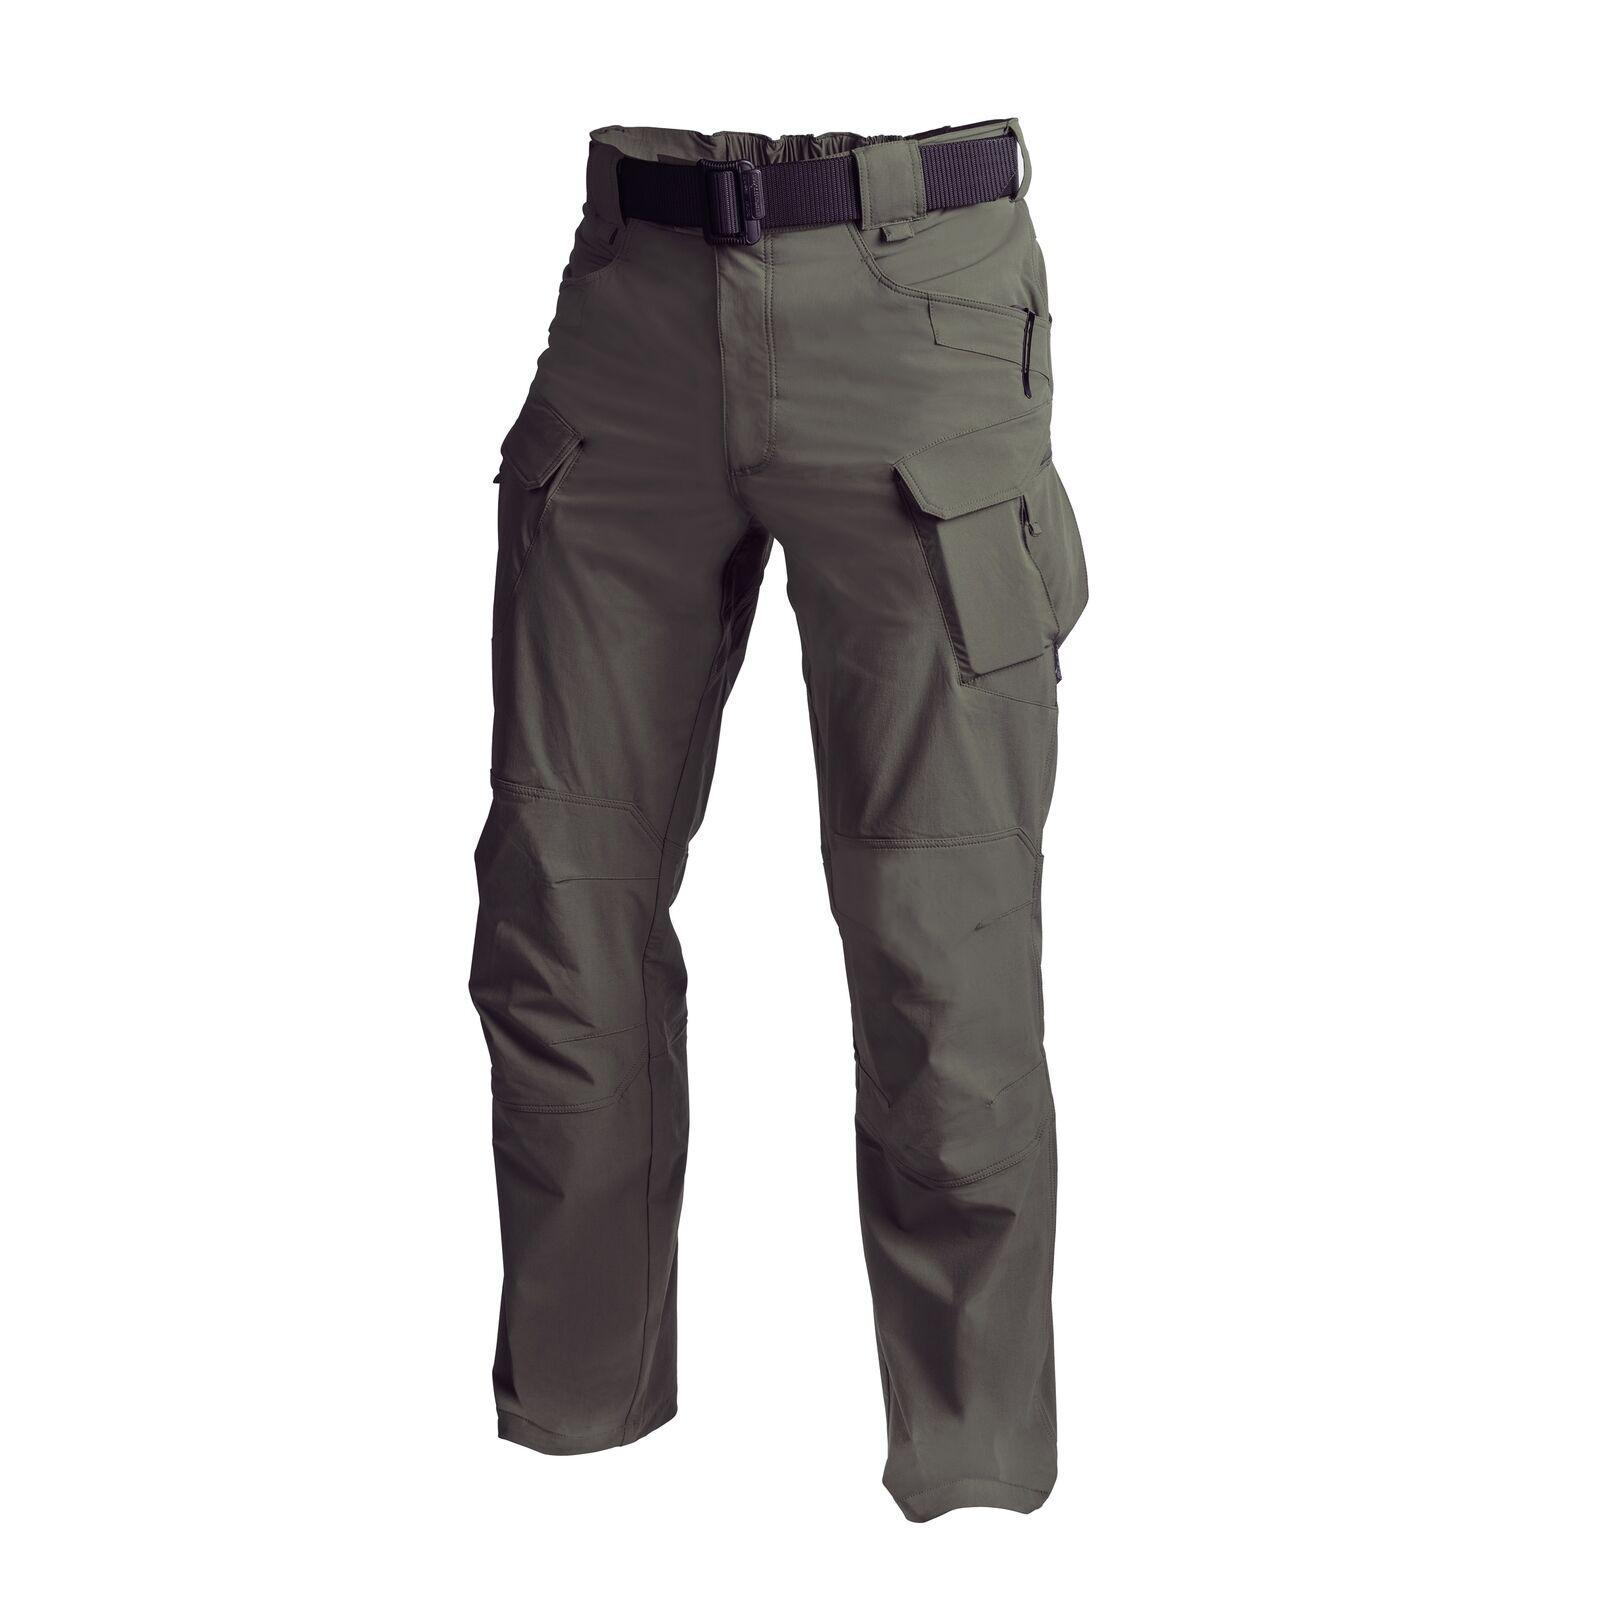 HELICON -Tex OTP Trousers (Yttre Taktiska Byxor) -VersaStretch -TAIGA grön